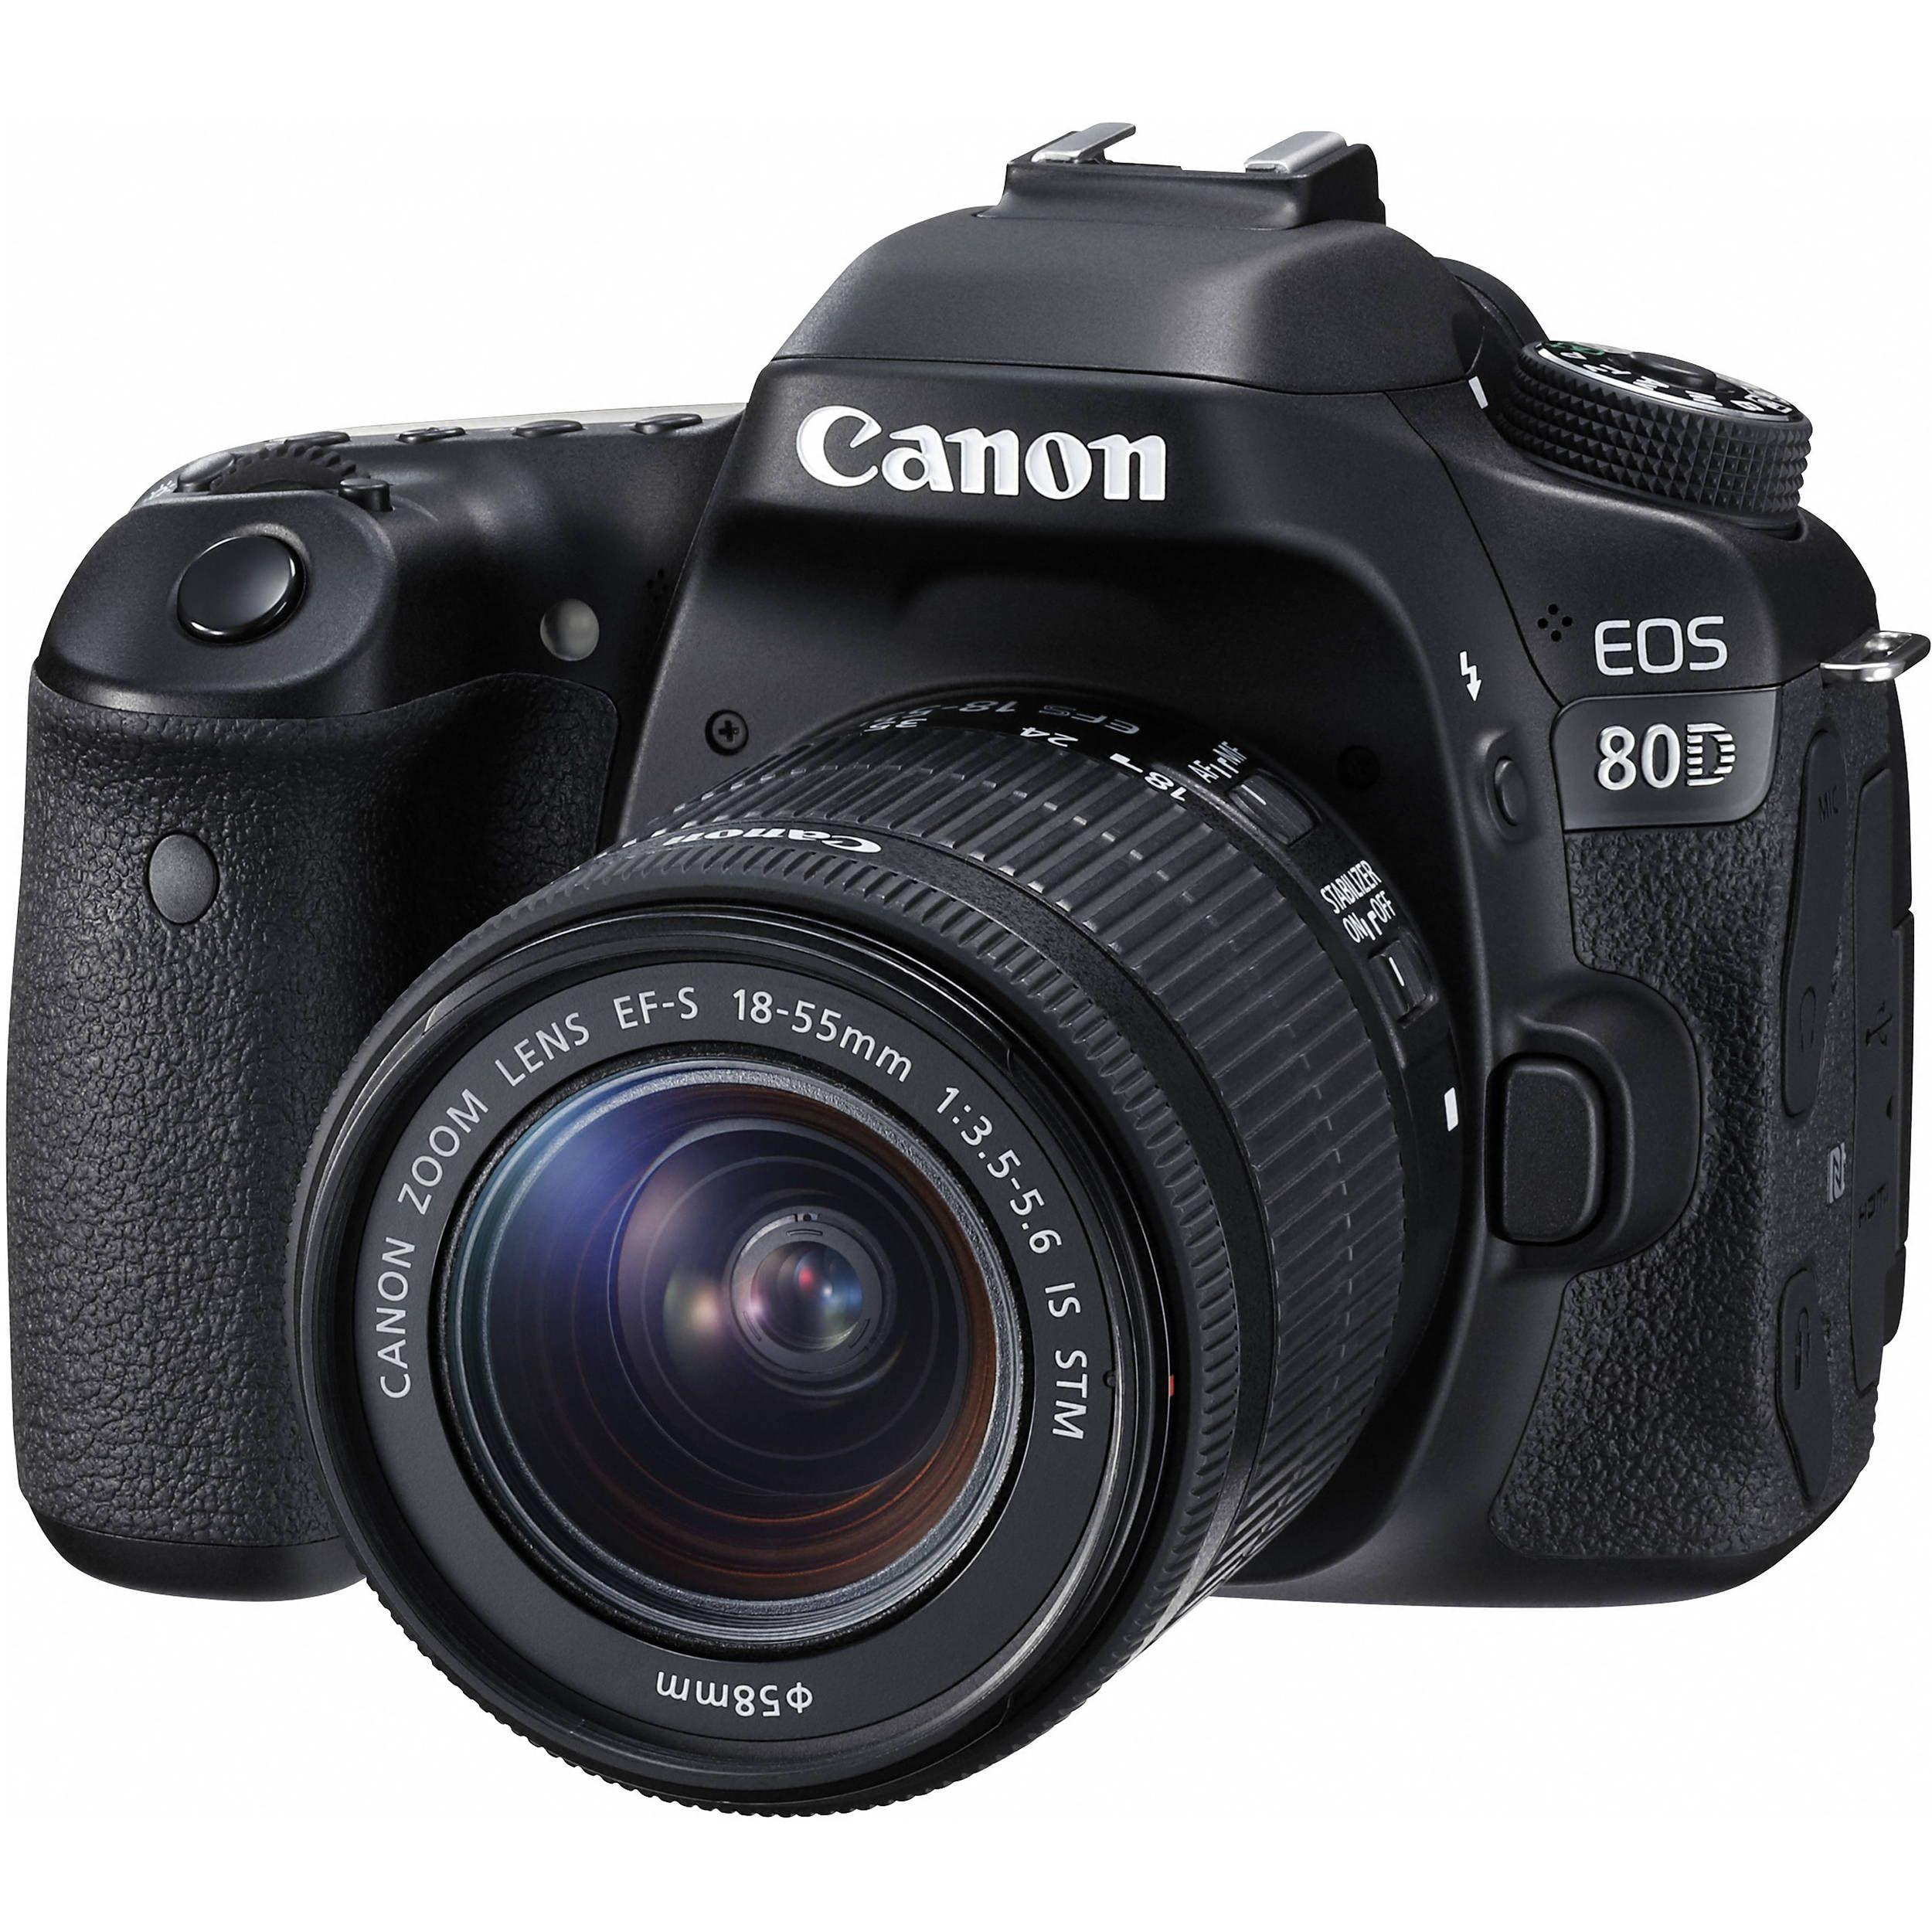 Canon Eos 80d Dslr Camera With 18 55mm Lens Canon Dslr Canon Camera Models Dslr Camera